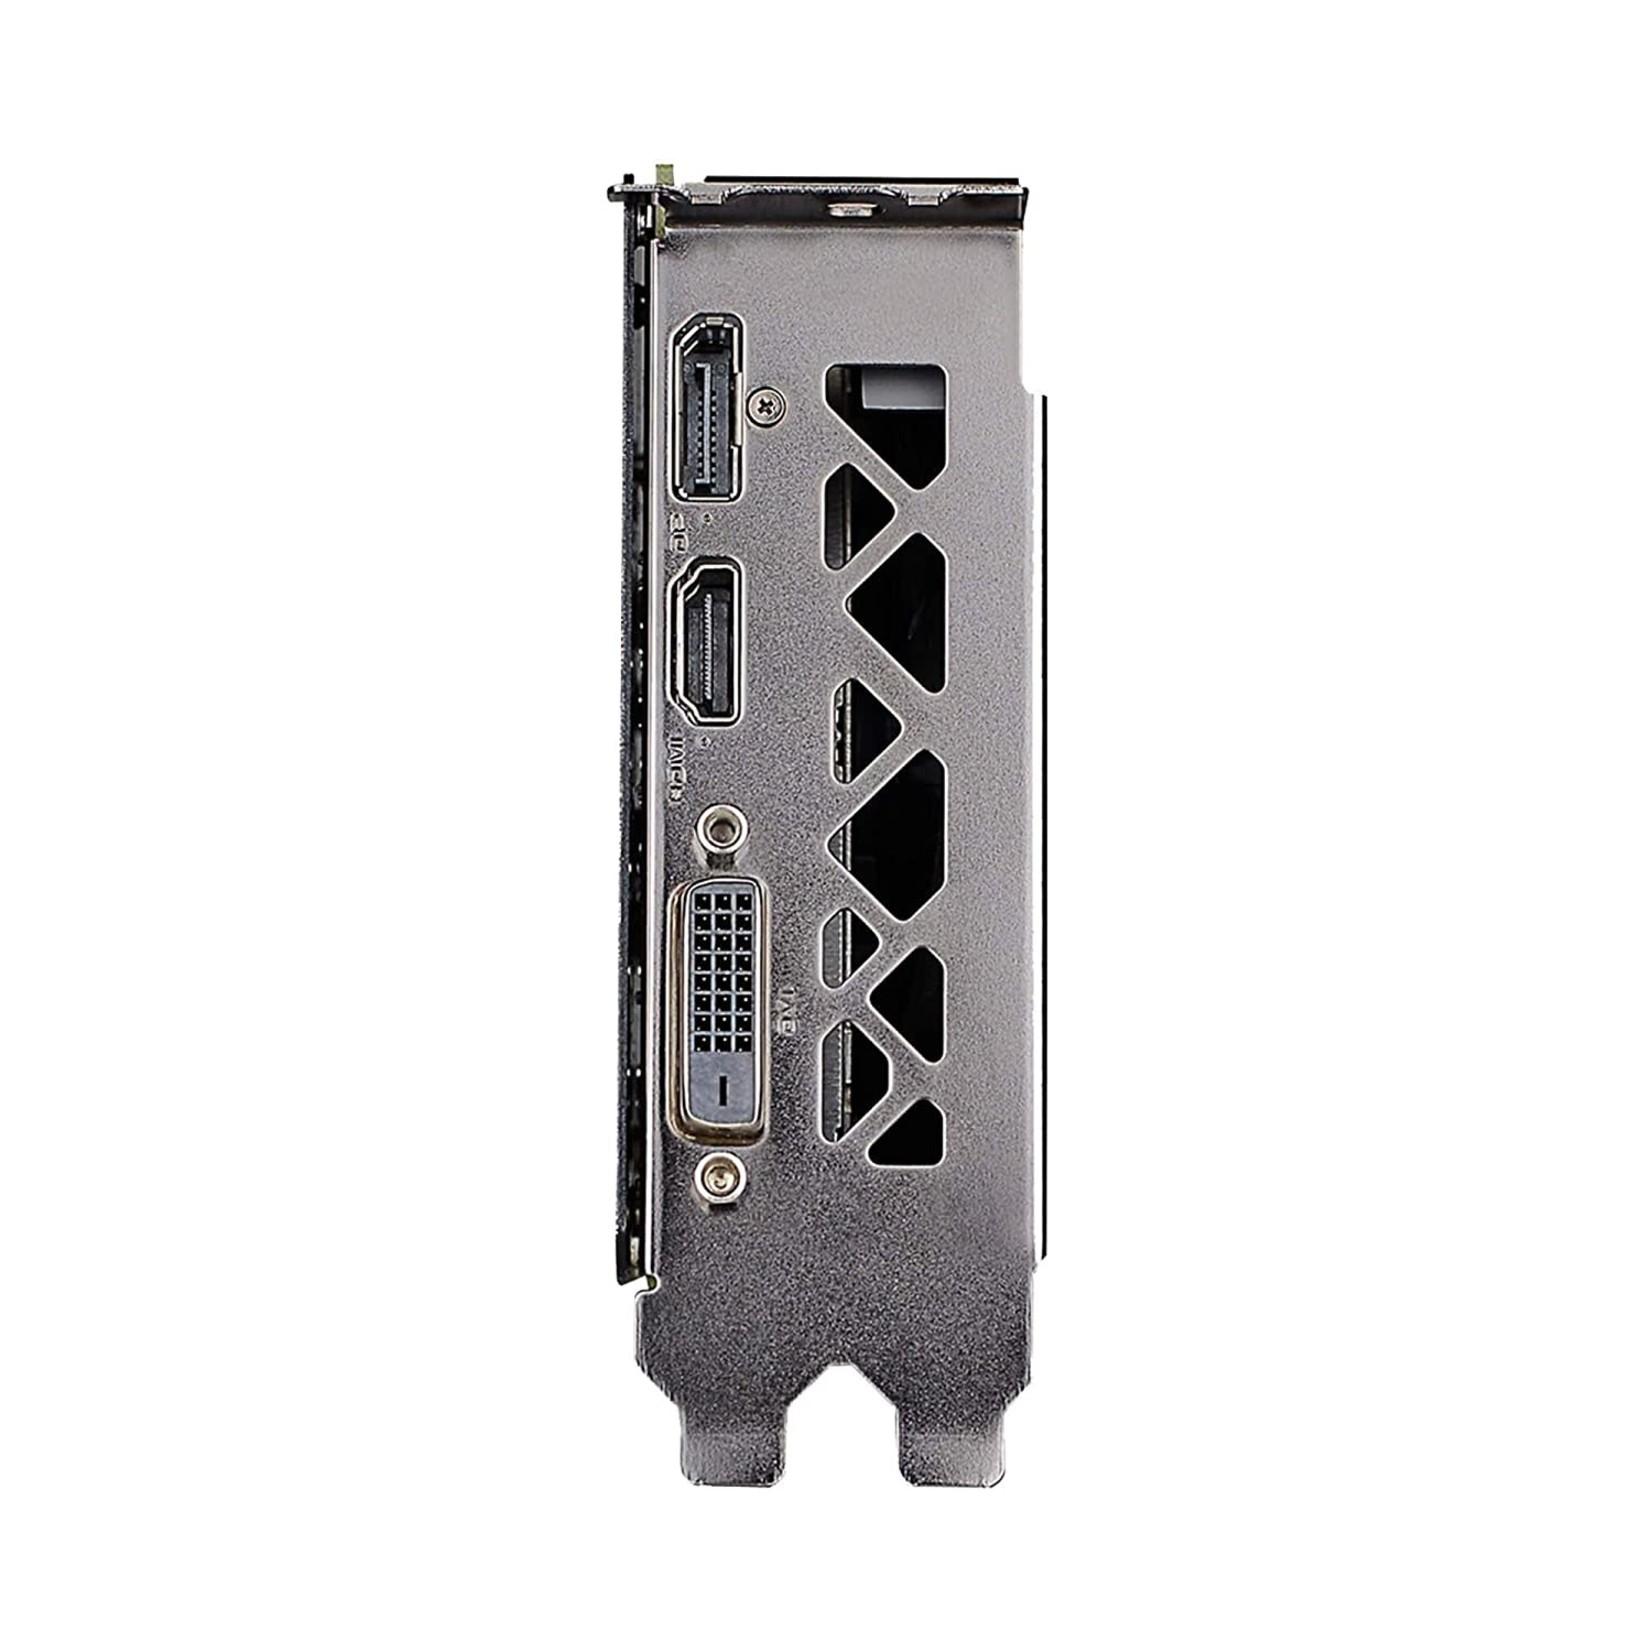 EVGA EVGA - Geforce GTX 1650 Super